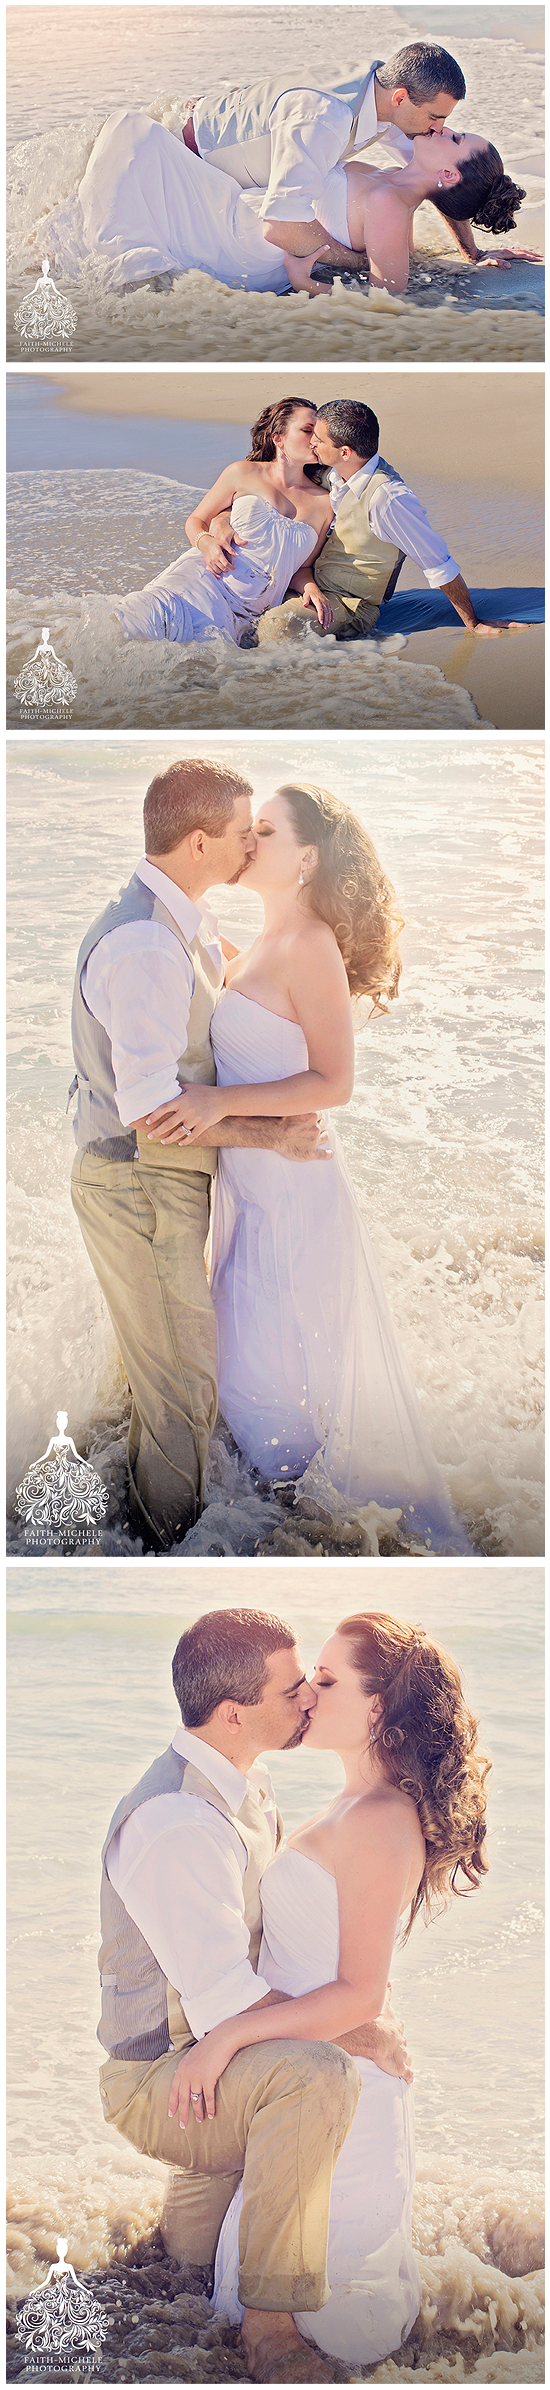 Venice Beach wedding photo